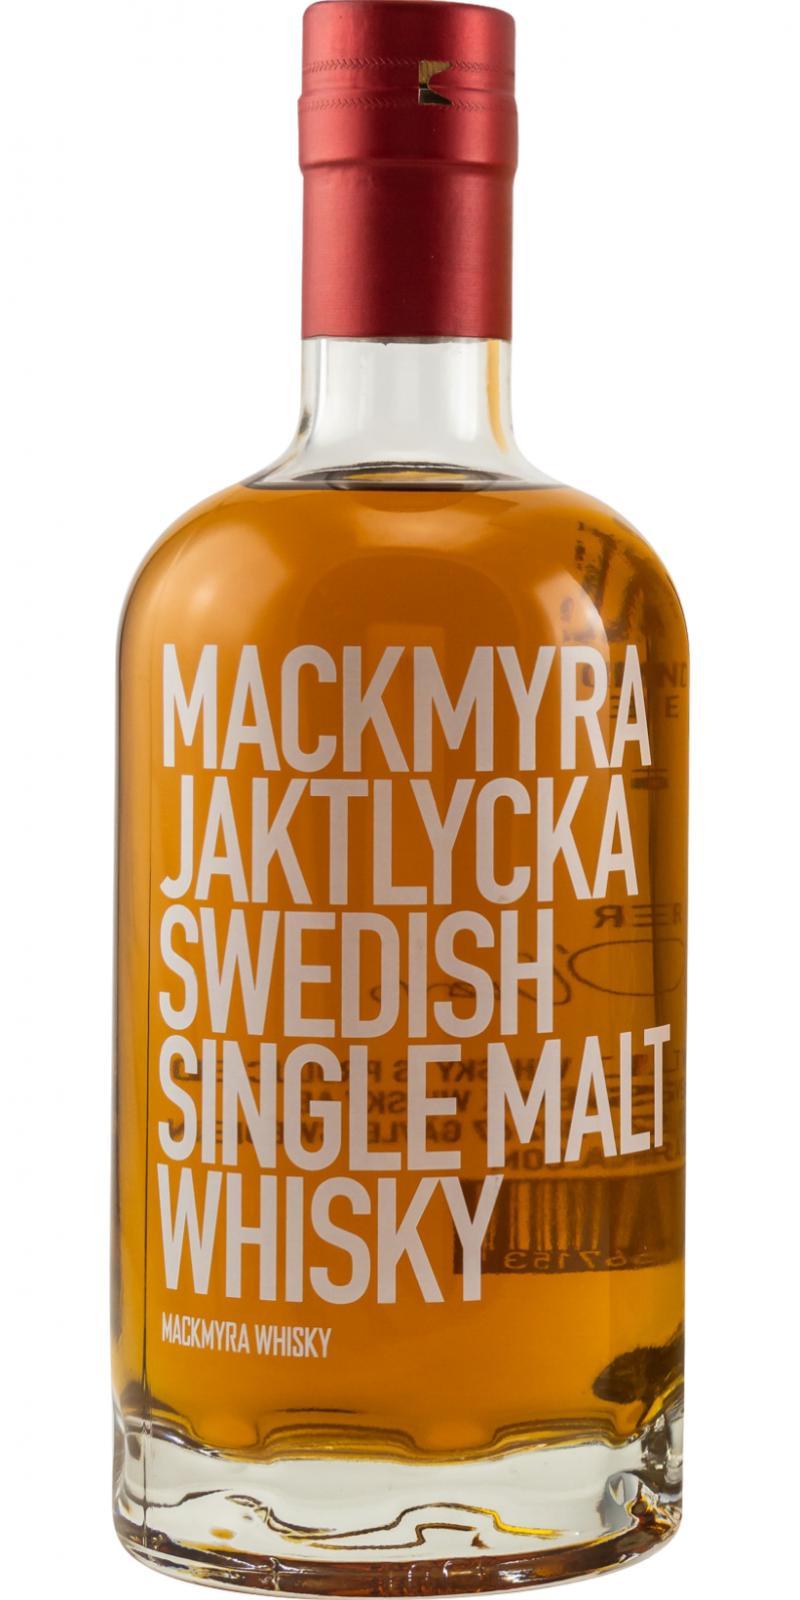 Mackmyra Jaktlycka